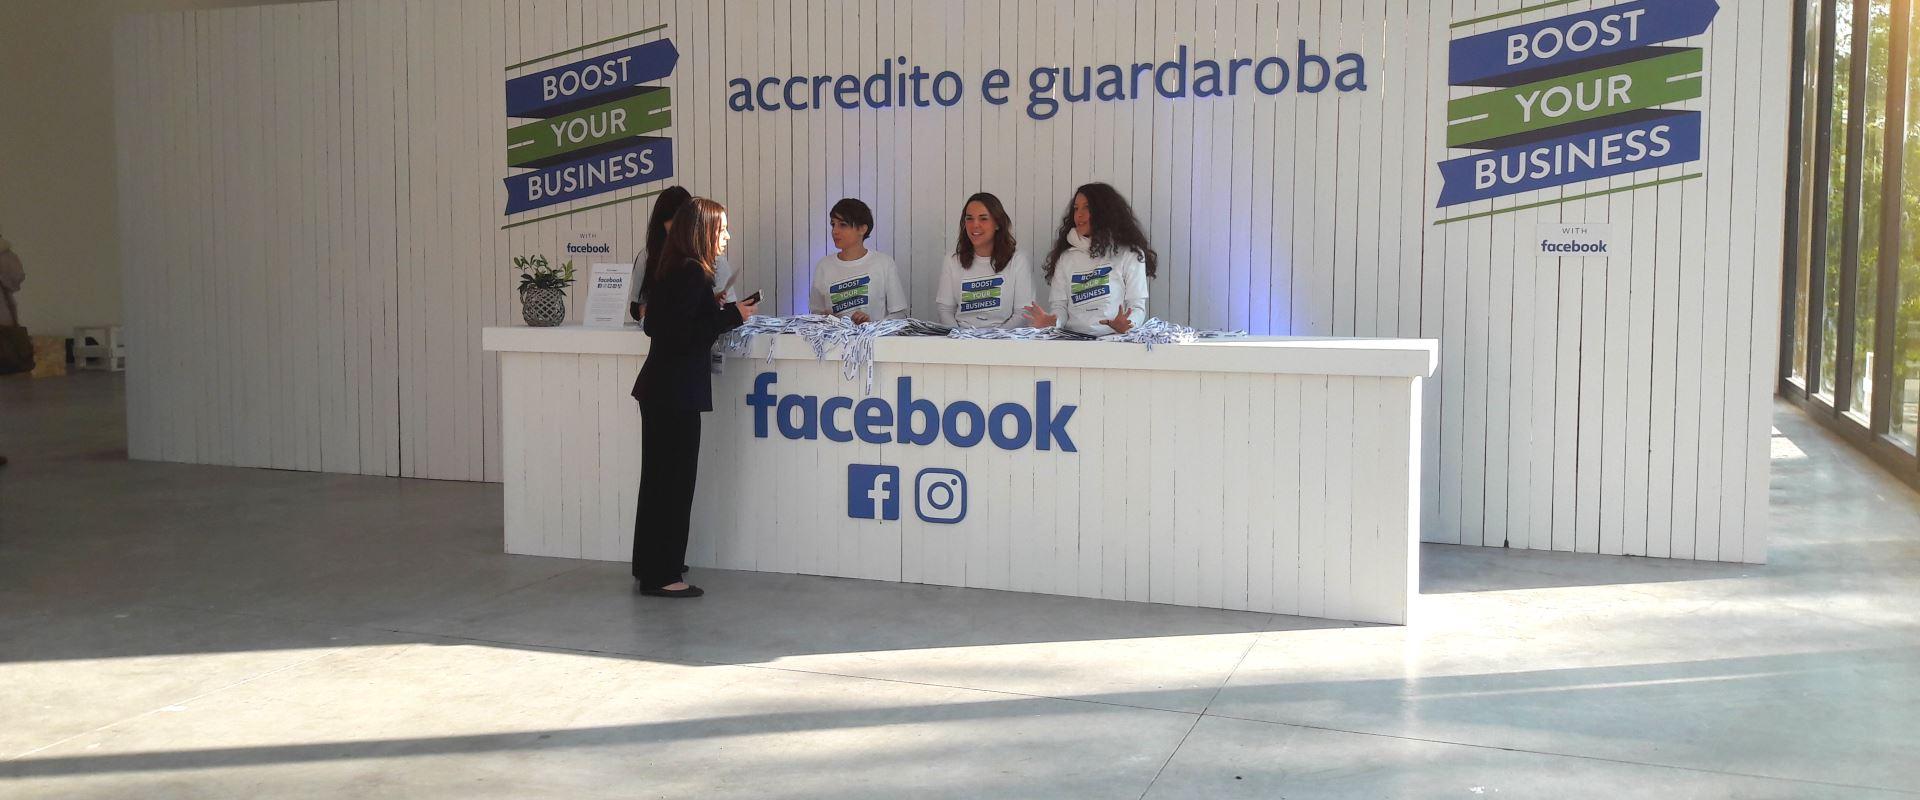 Login facebook senza password, reale non virtuale